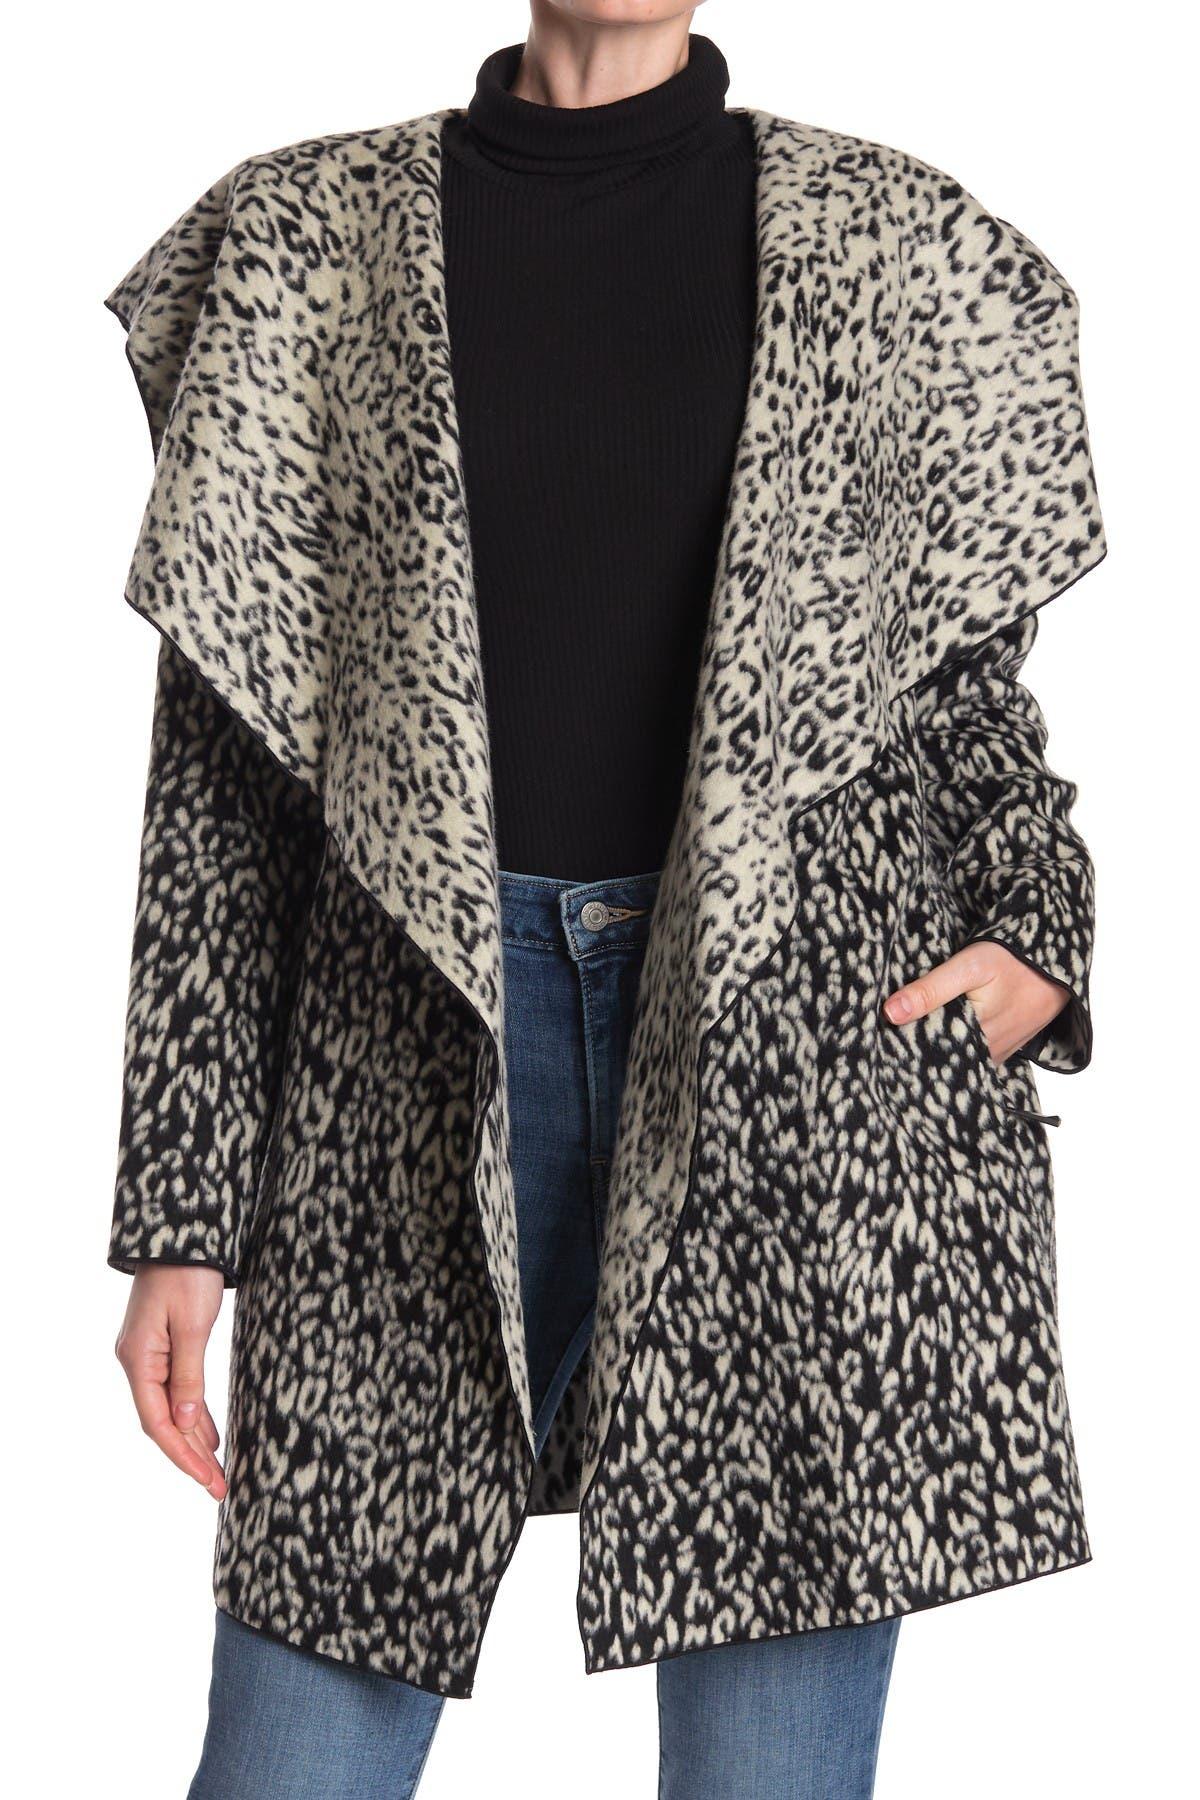 Image of BCBGMAXAZRIA Snow Leopard Hooded Wool Blend Wrap Coat